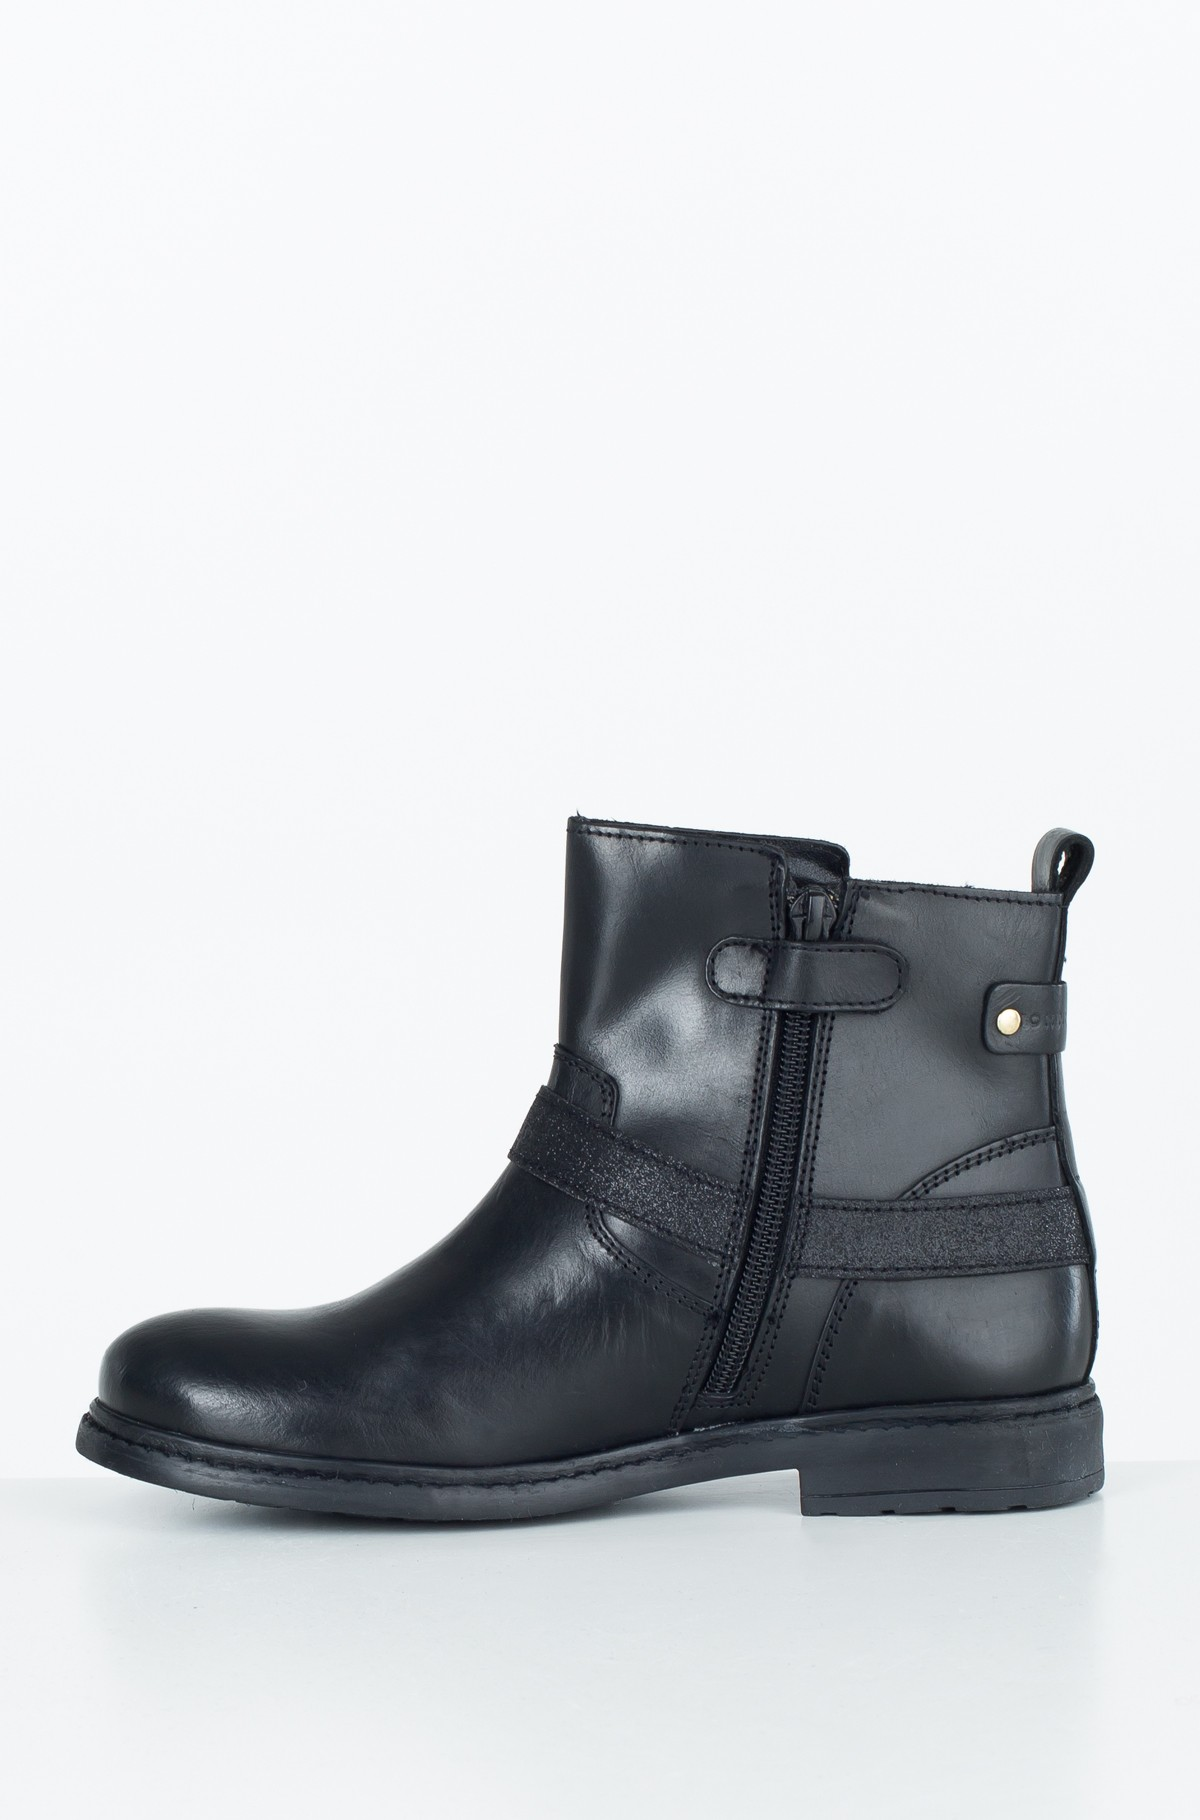 Vaikiški batai T3A6-30055-0383999-full-2